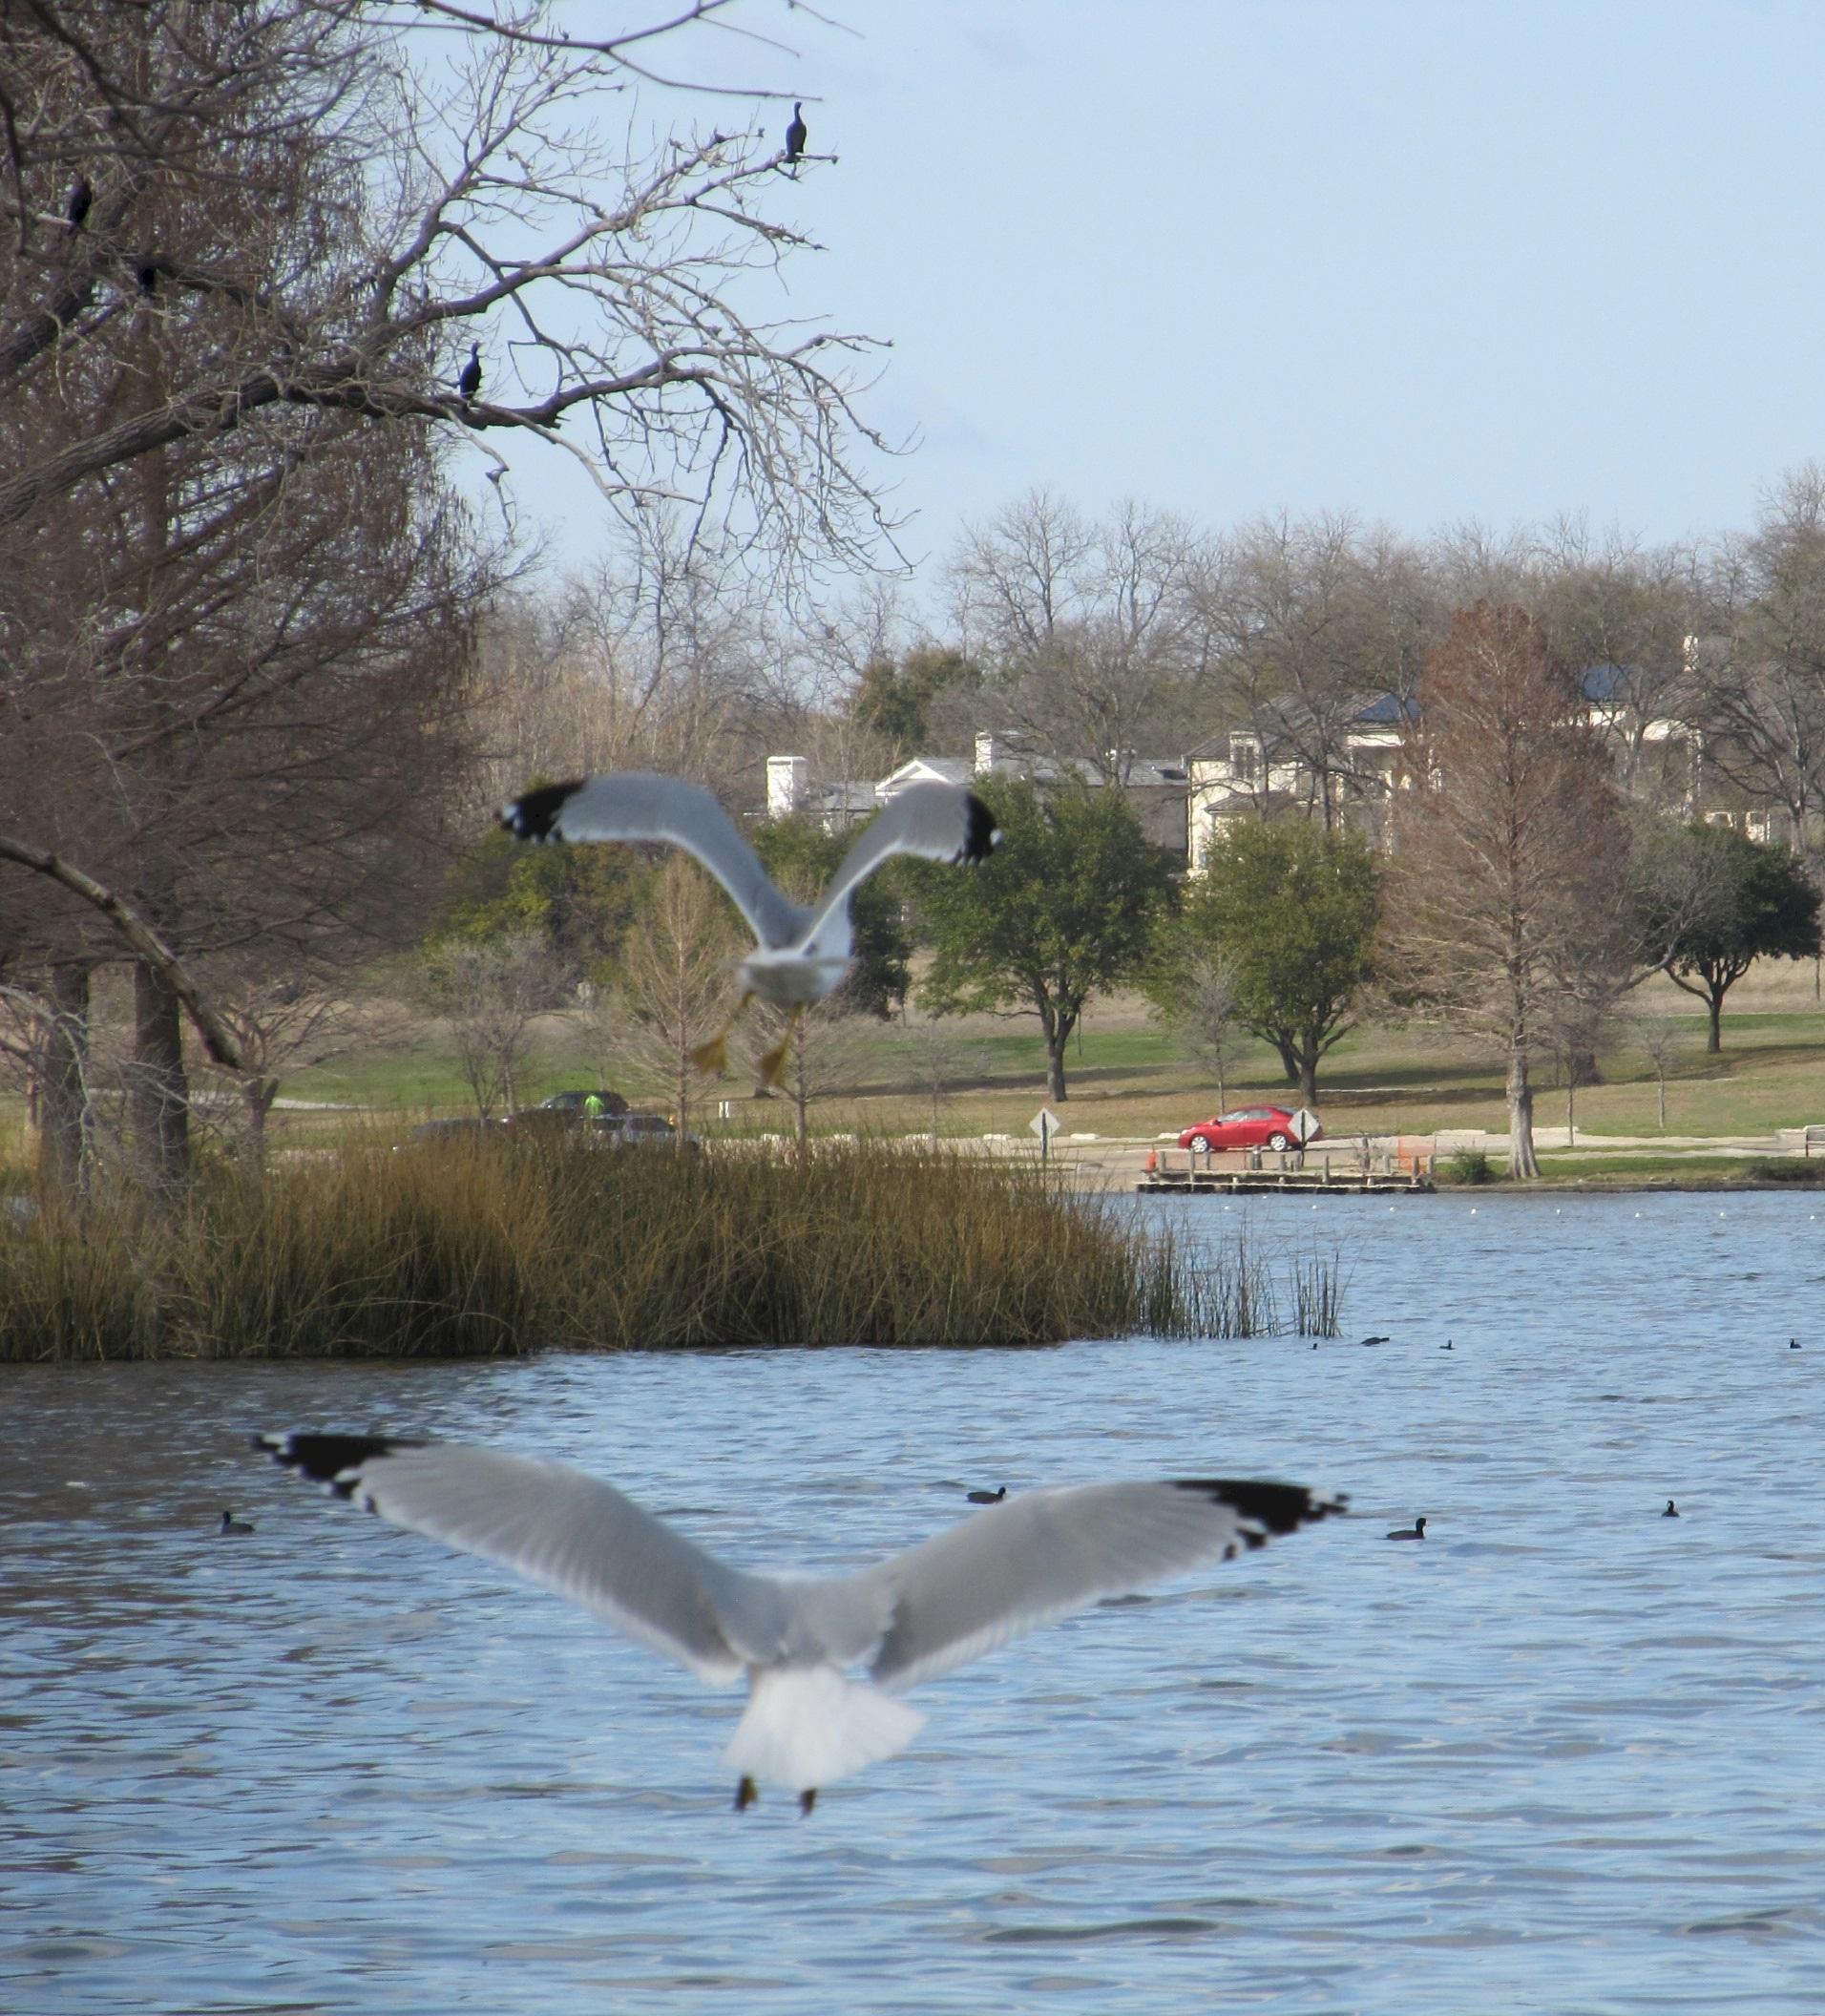 Birds flying on the lake photo